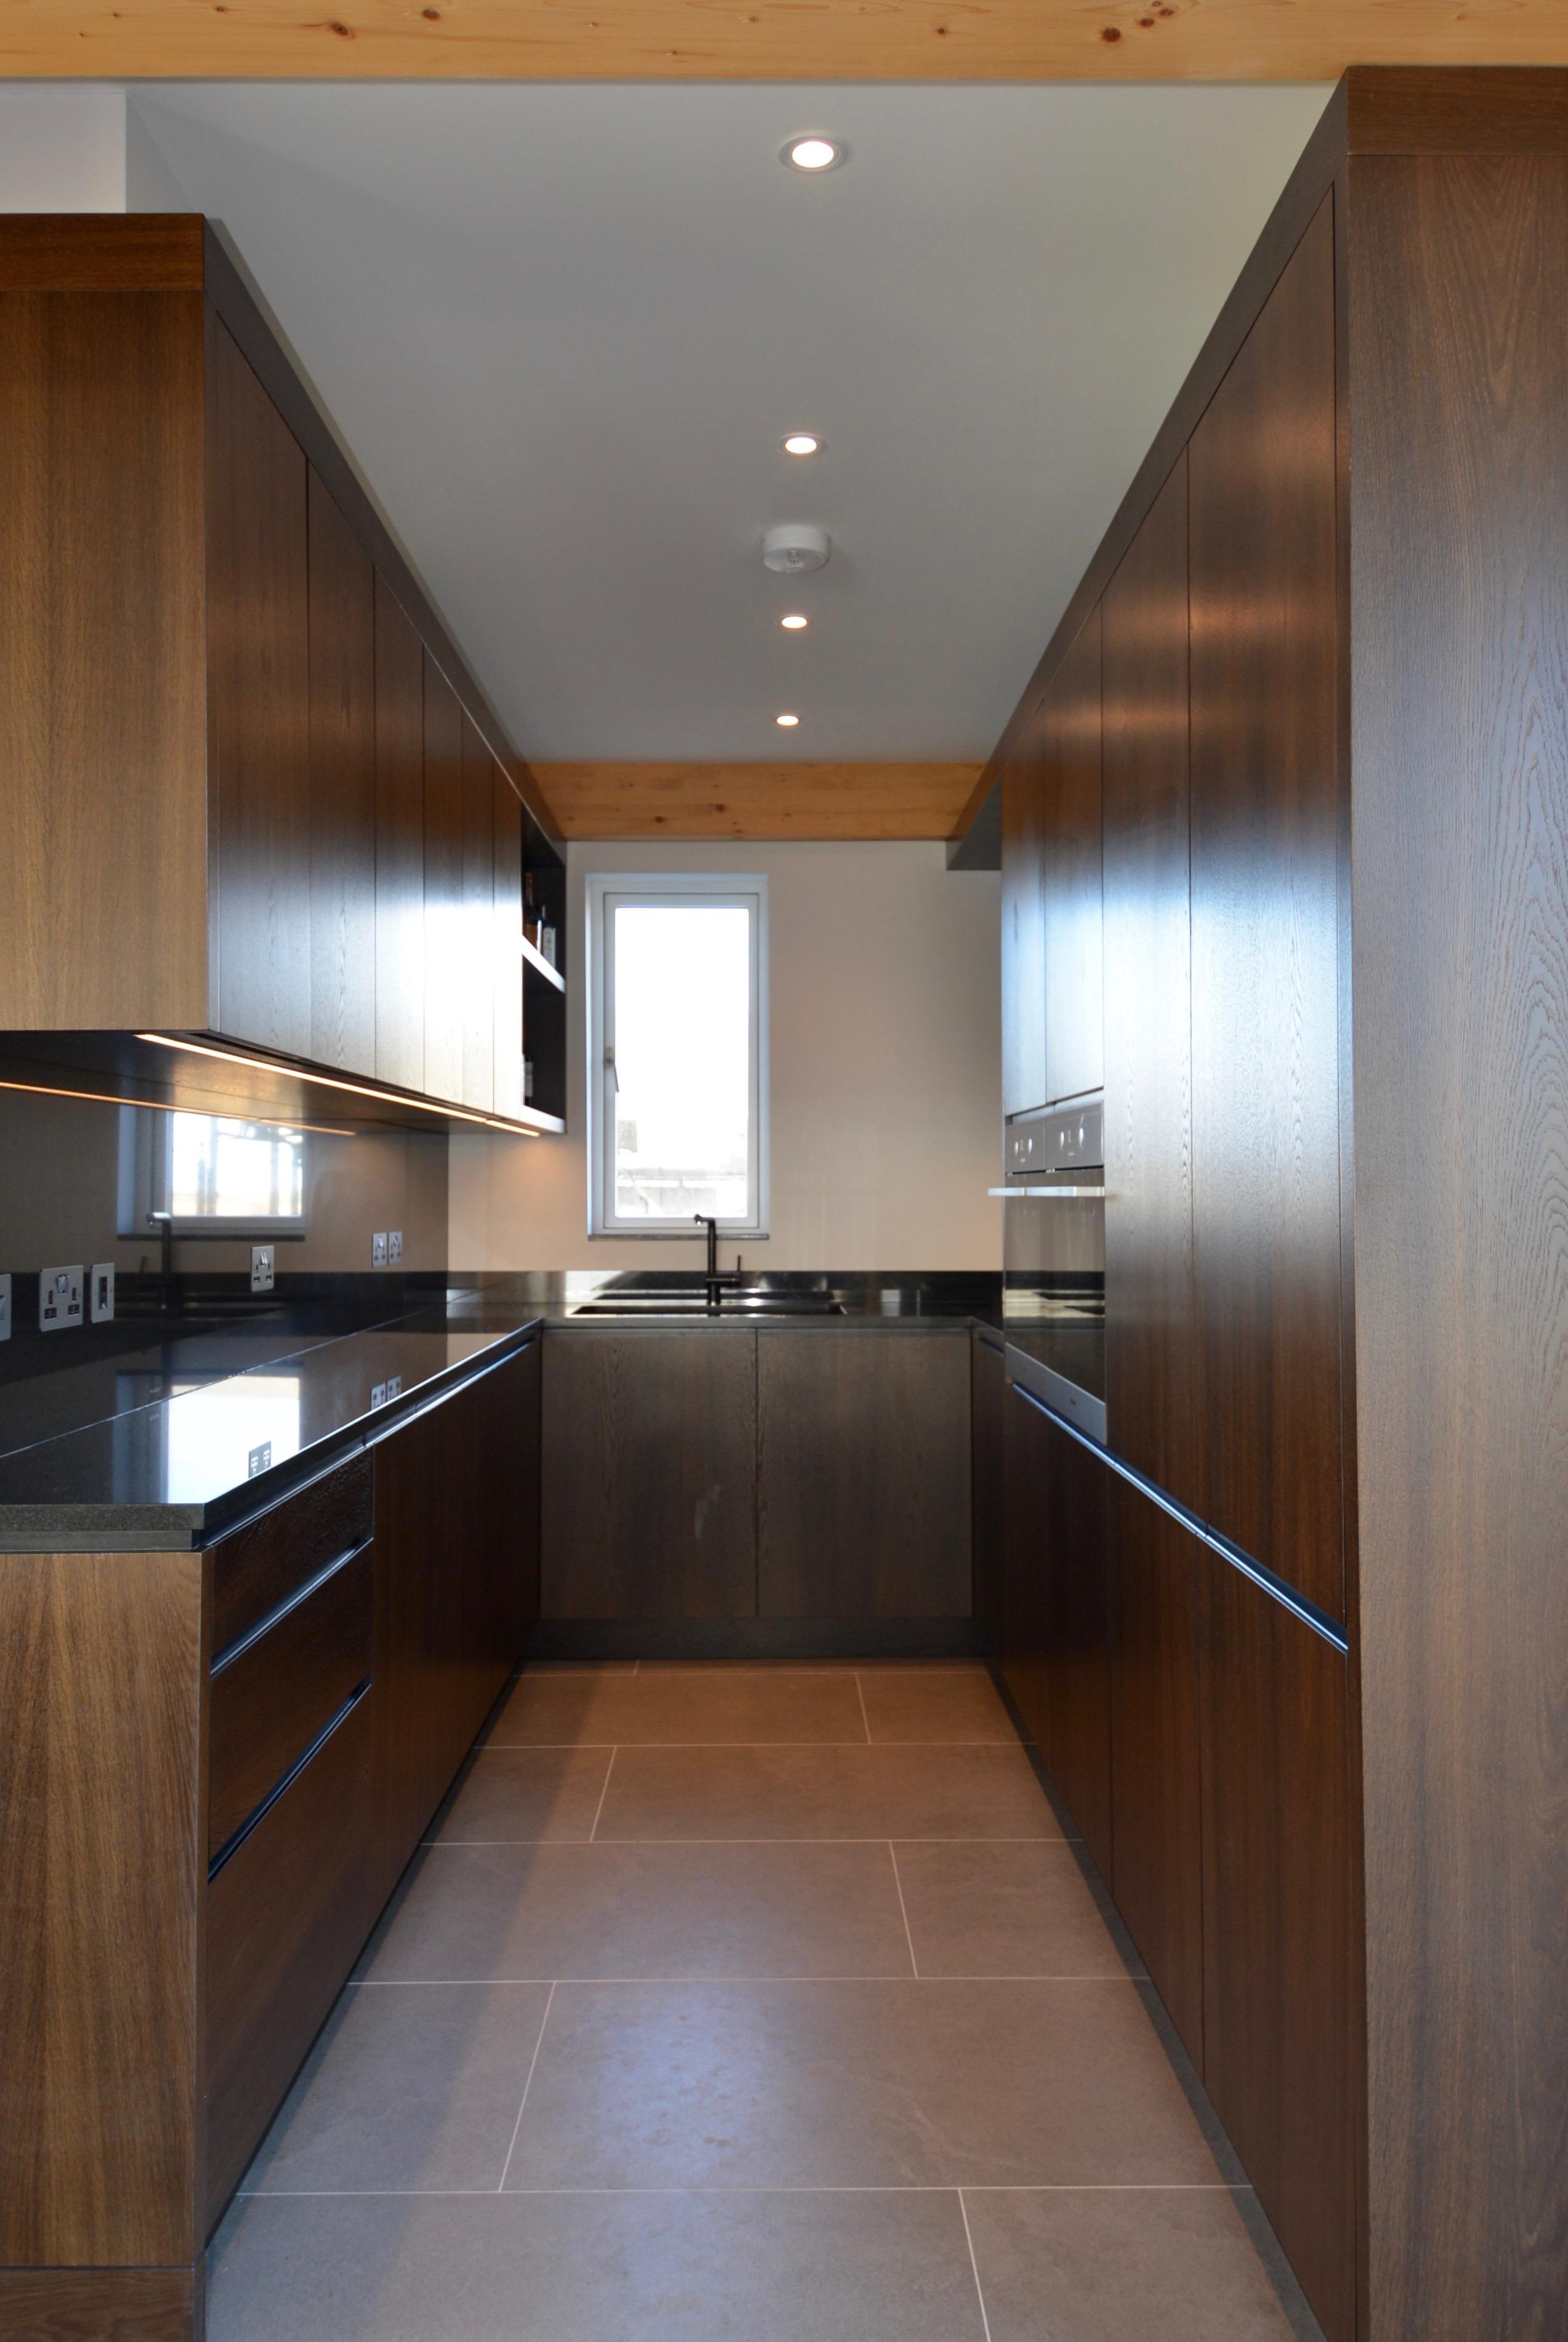 2. Main Kitchen